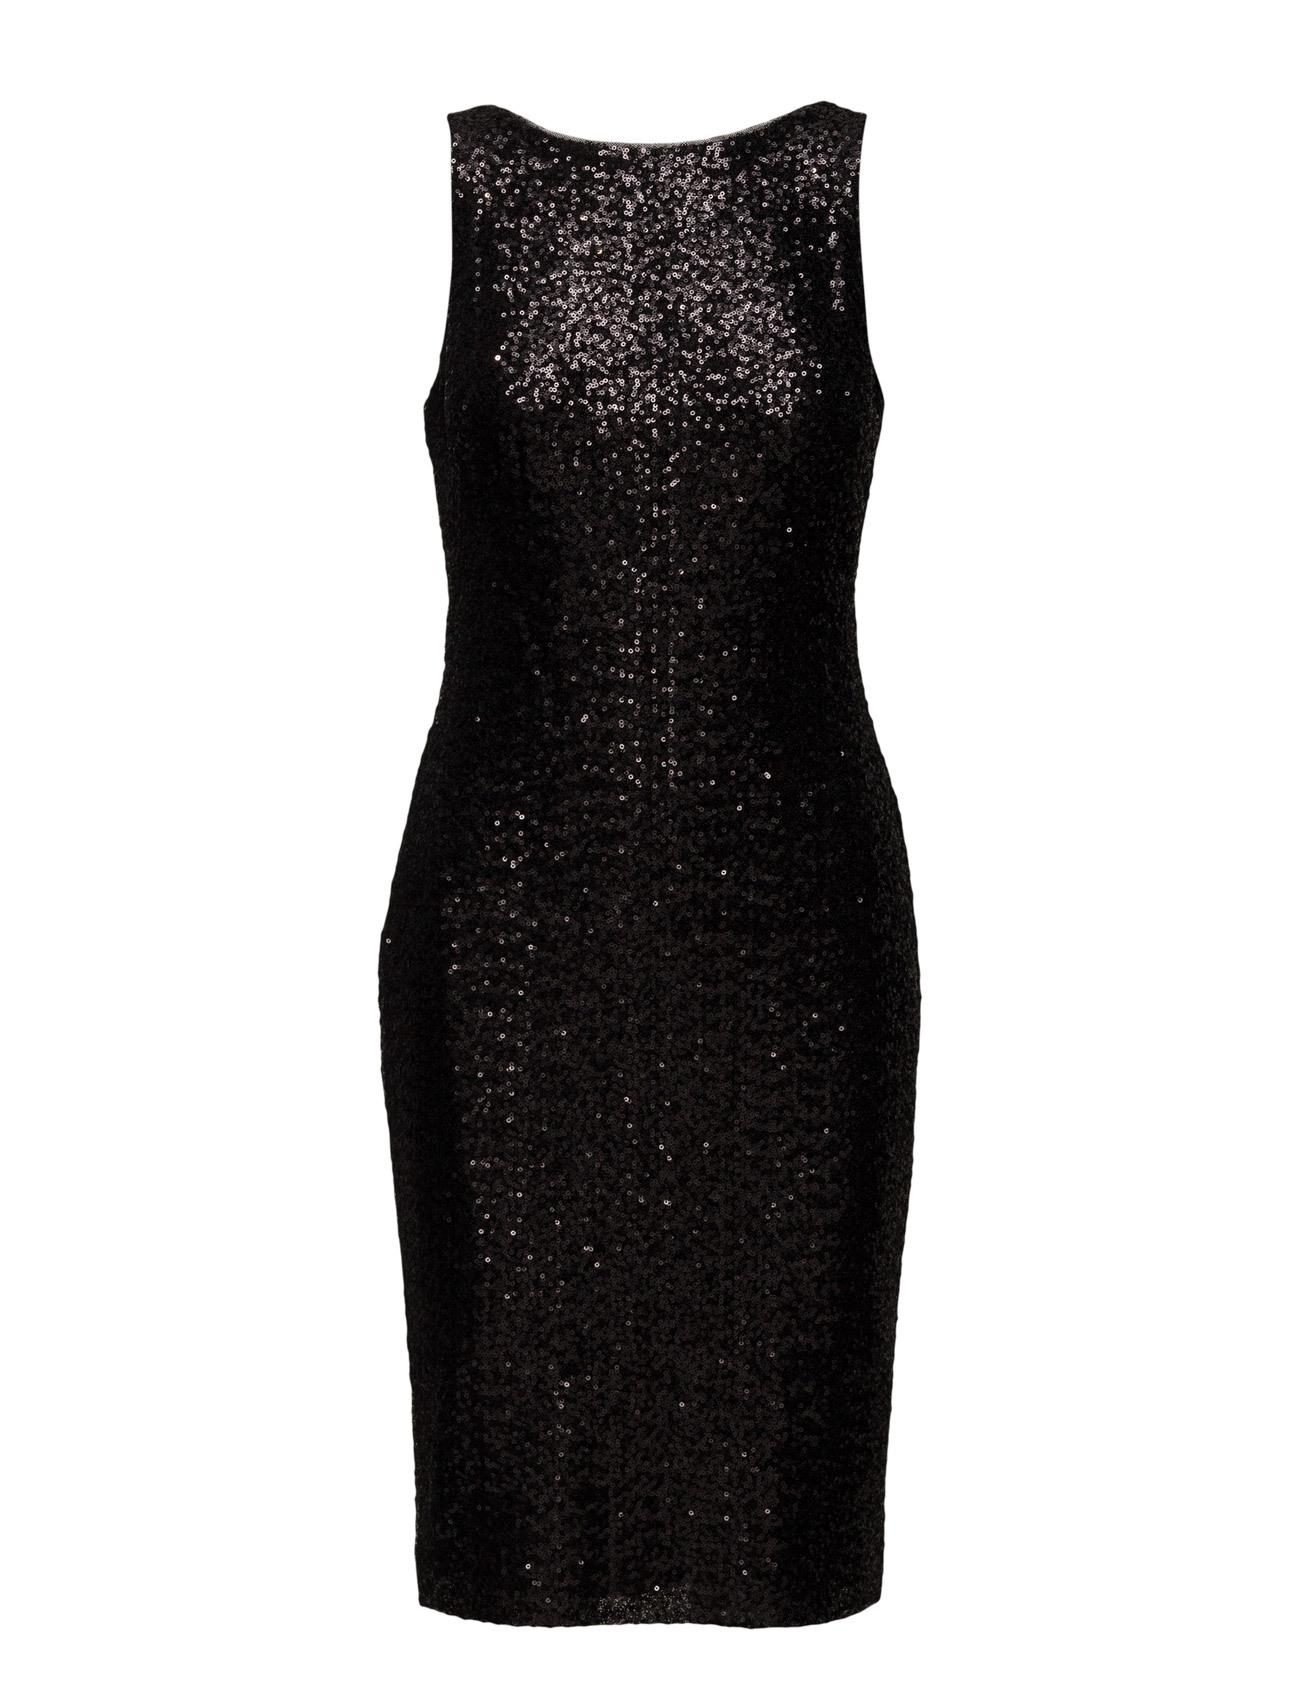 10 Coolste Kleider Günstig Design10 Spektakulär Kleider Günstig Stylish